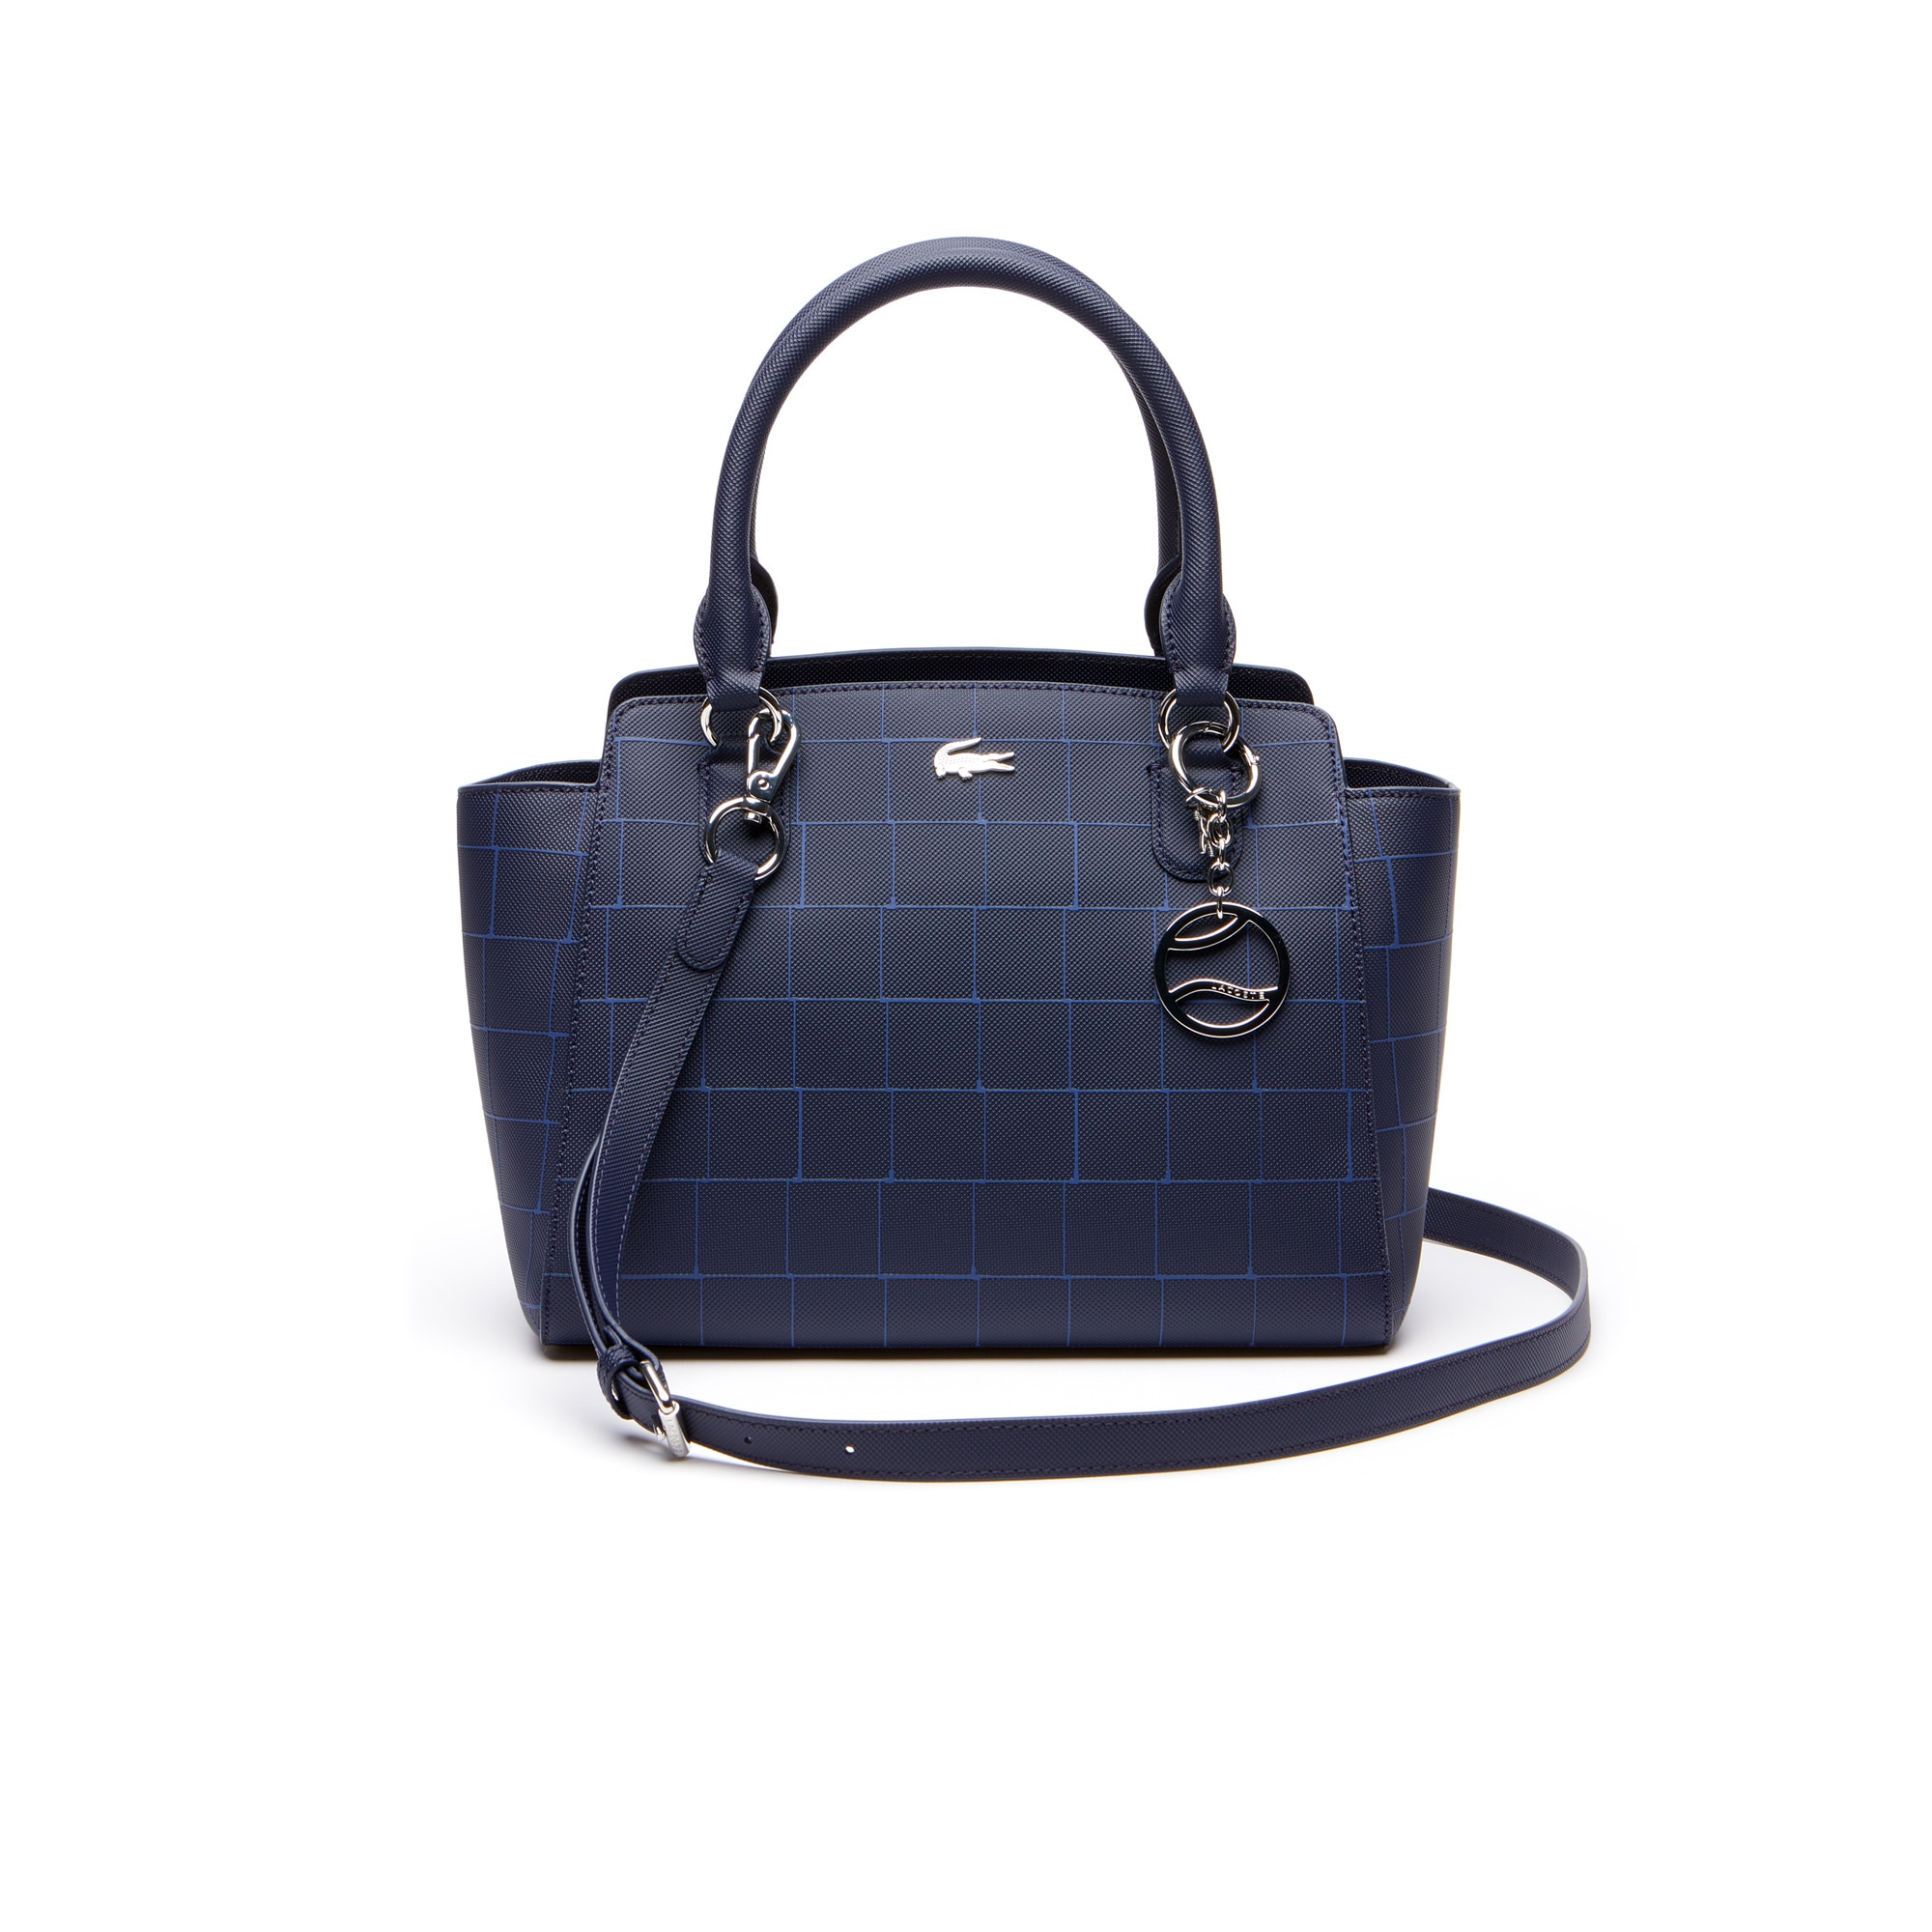 Shopping bag a soffietto in tela piqué spalmata con stampa a quadretti Daily Classic da donna